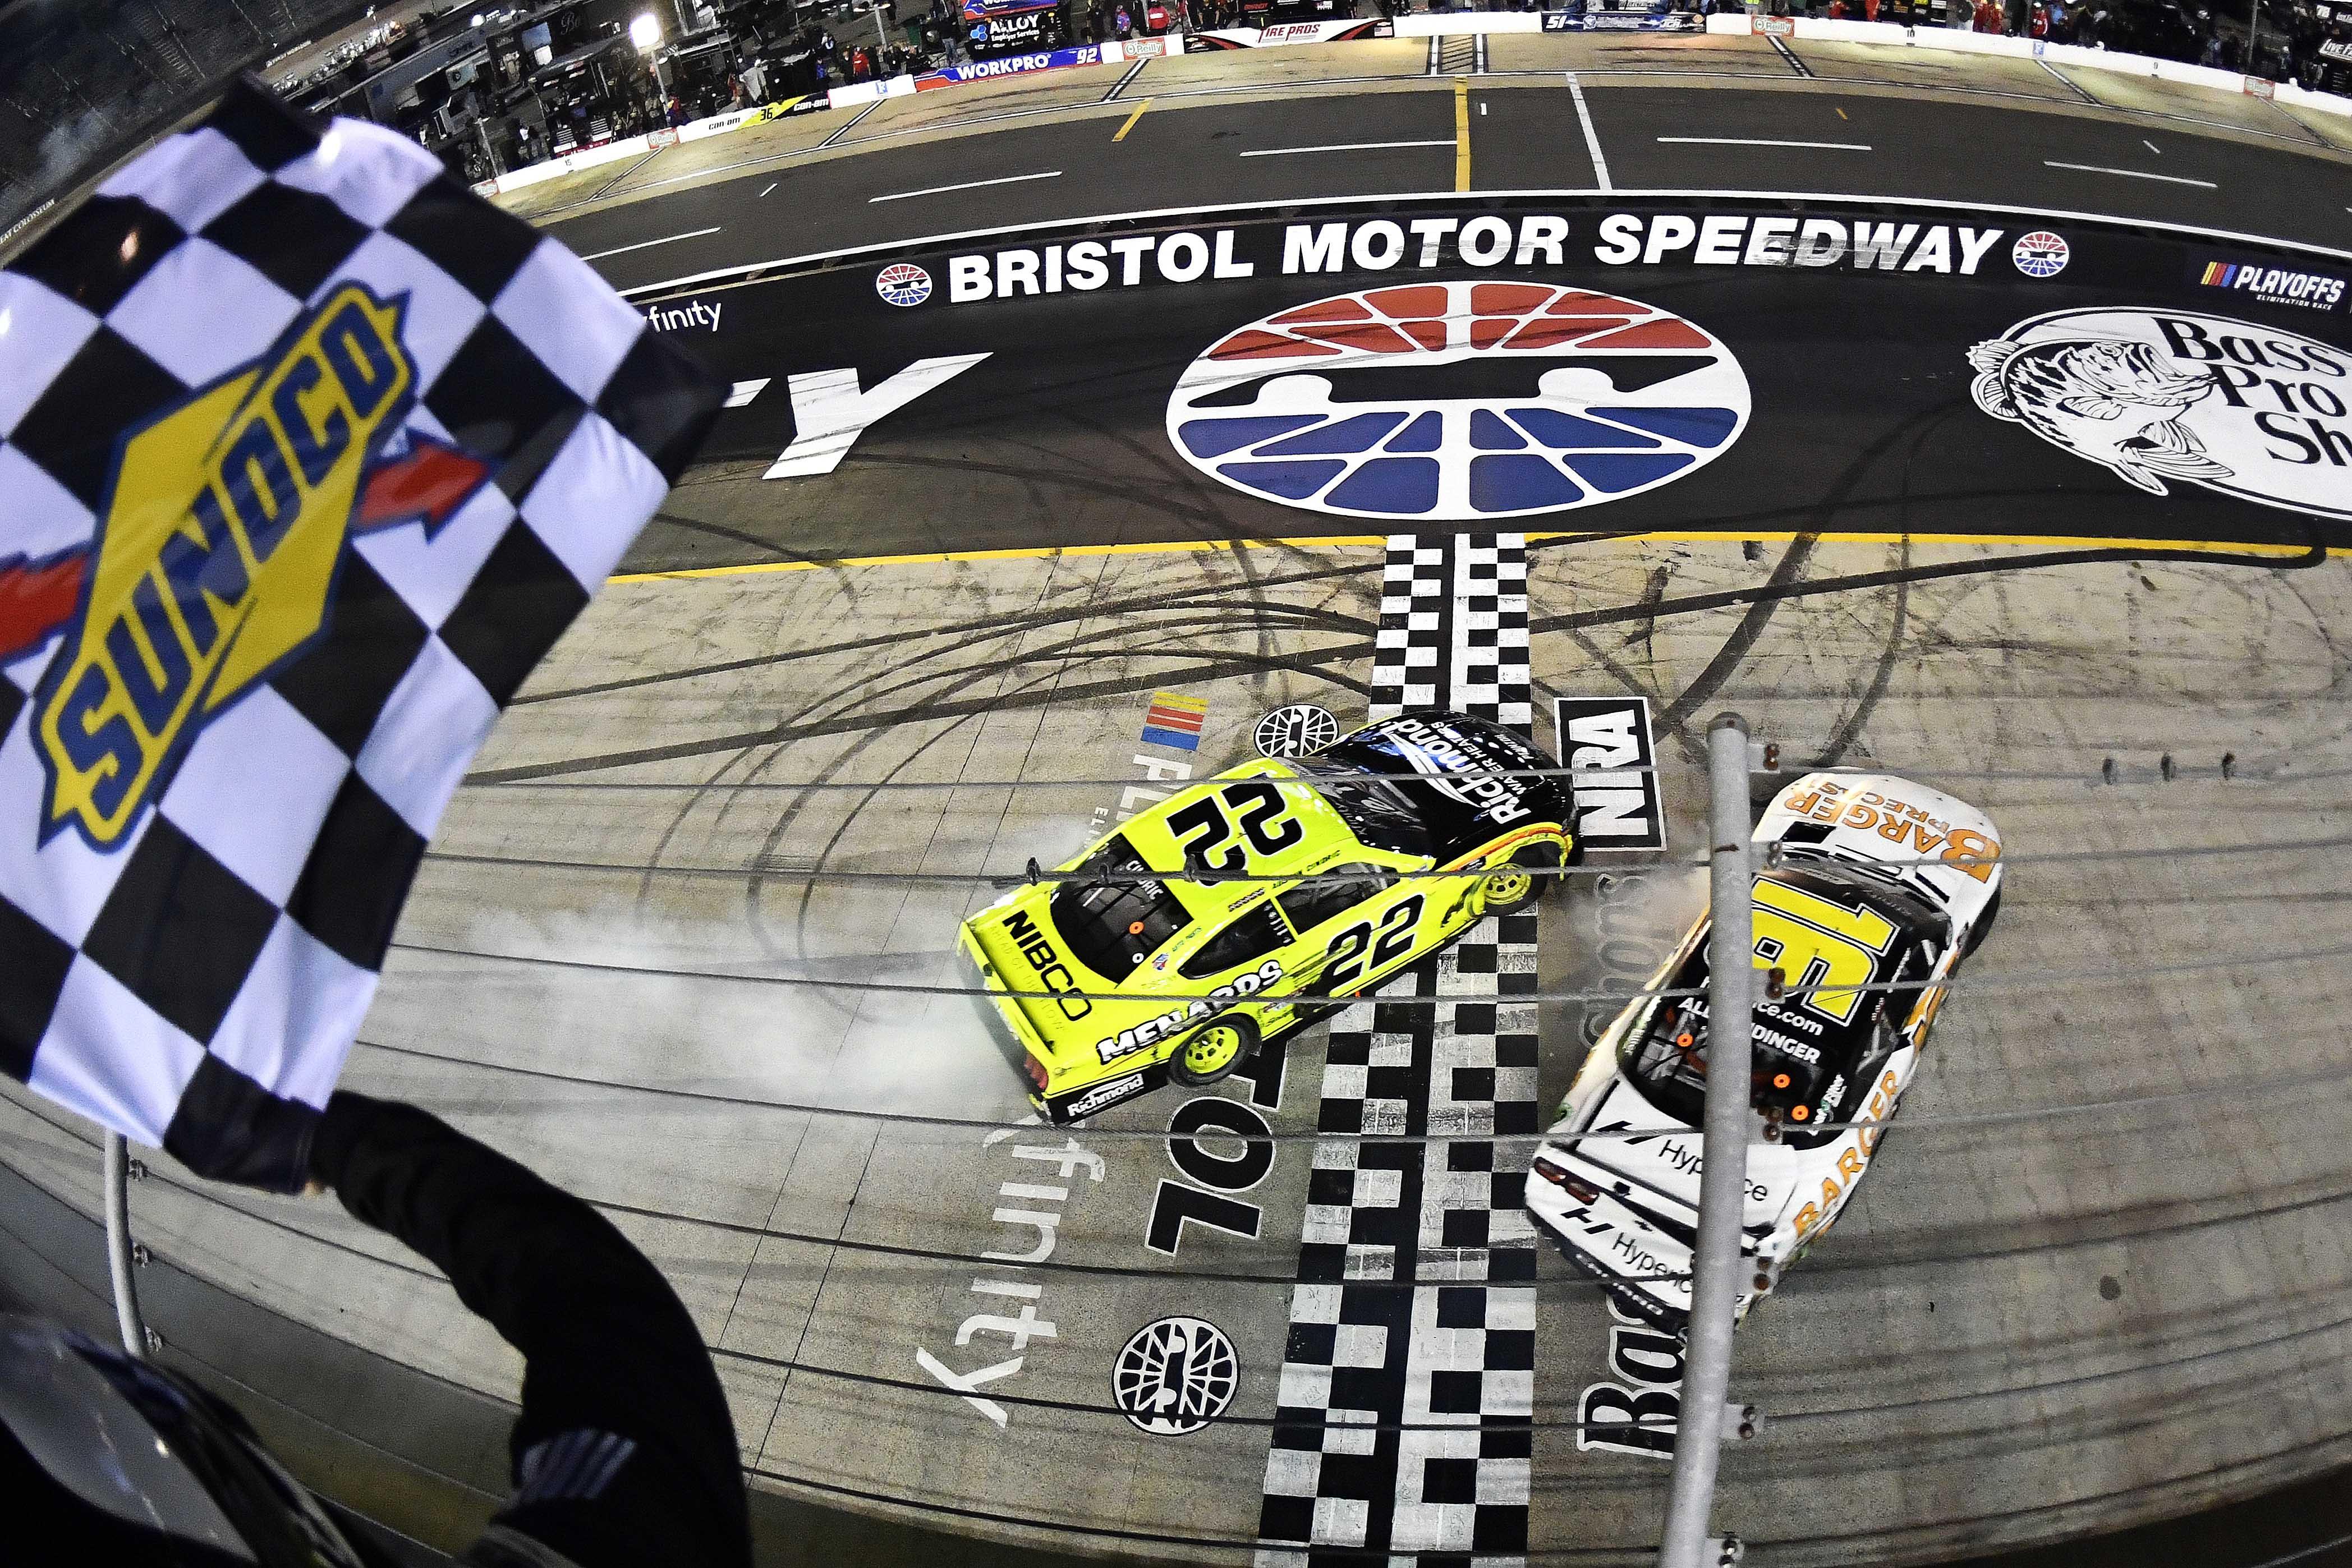 AJ Allmendinger, Austin Cindric crash at finish - Bristol Motor Speedway - NASCAR Xfinity Series